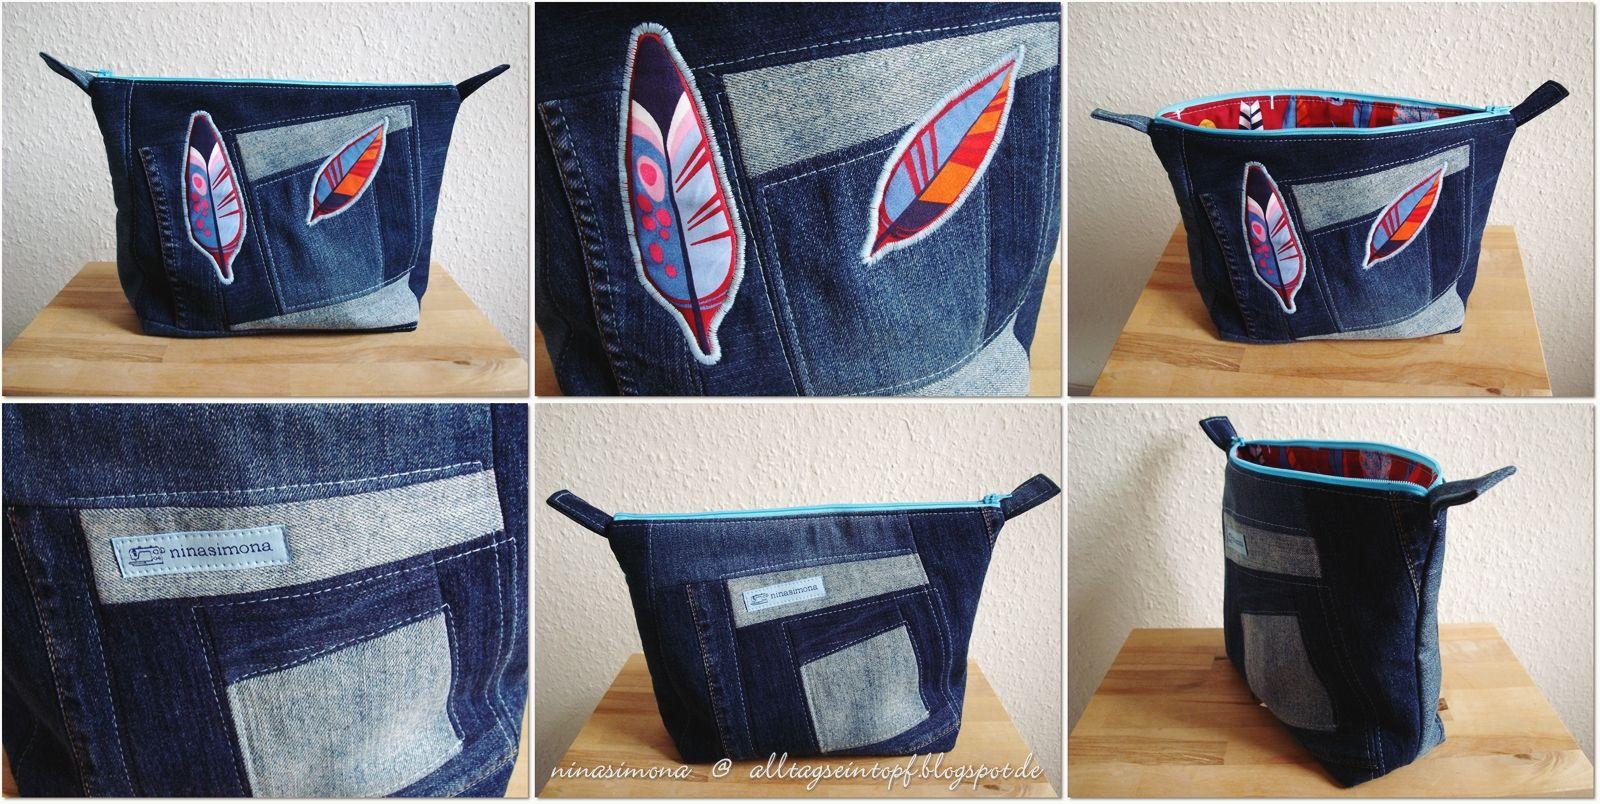 Alltagseintopf Jeans Upcycling Amp Resteverwertung